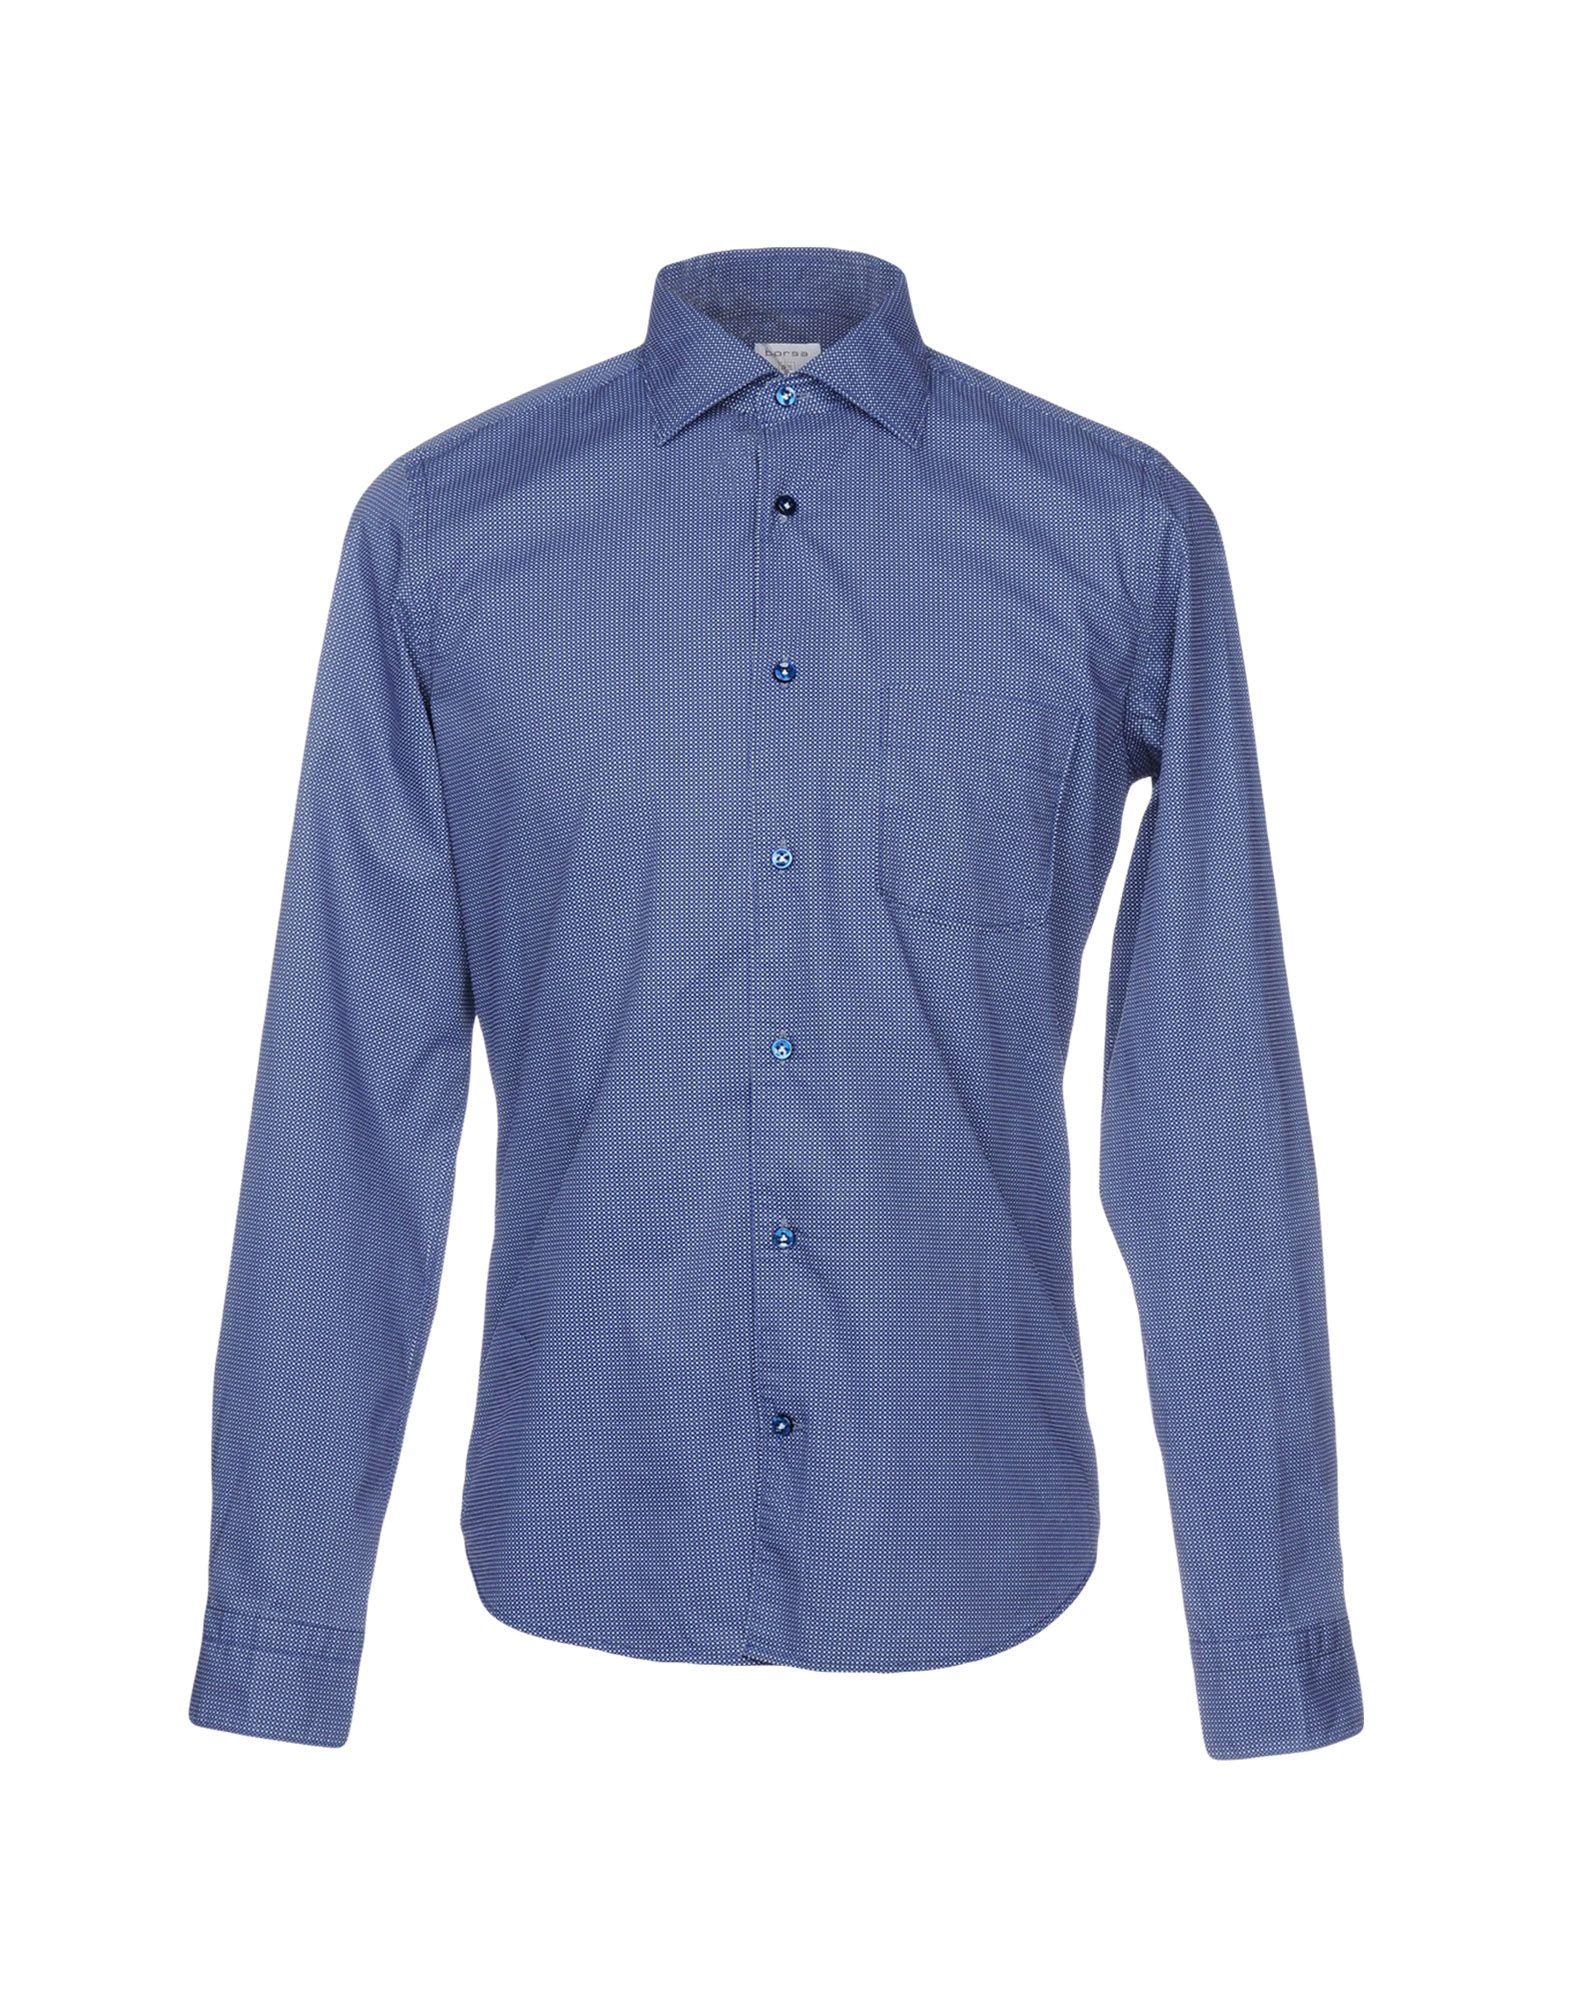 BORSA Patterned Shirt in Blue